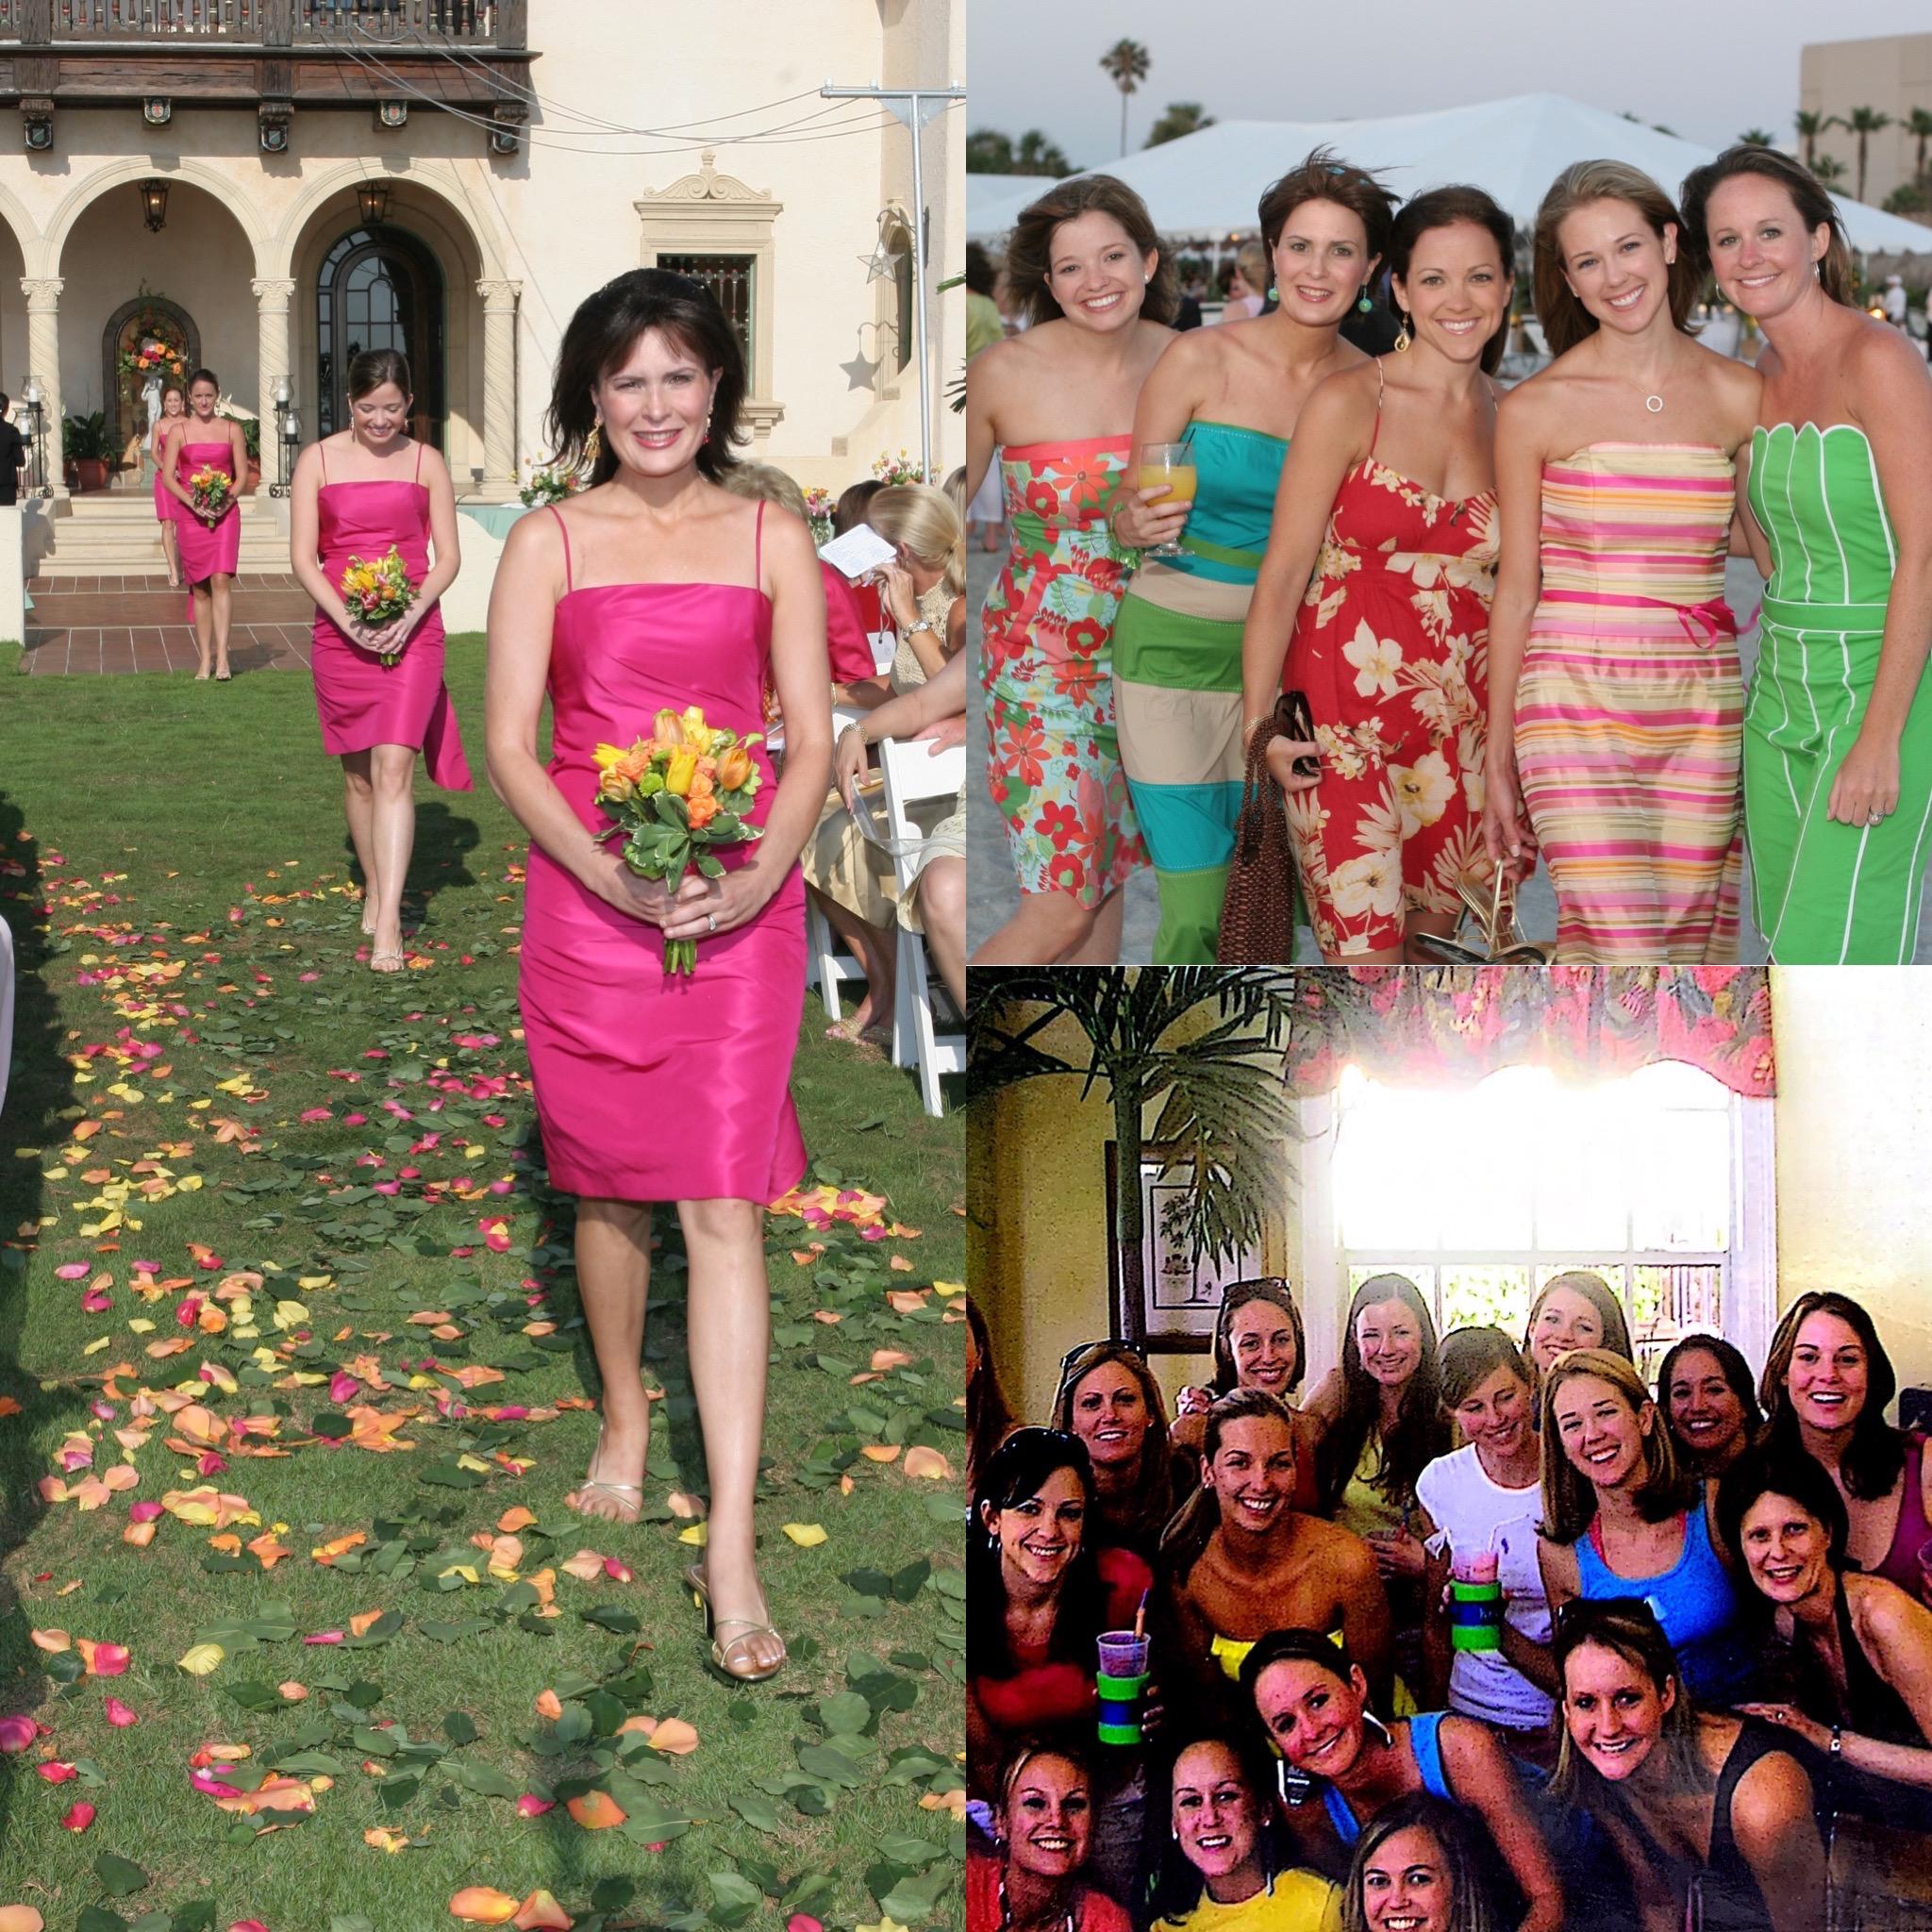 Kim lackey Hodgkin's Disease a rare cancer